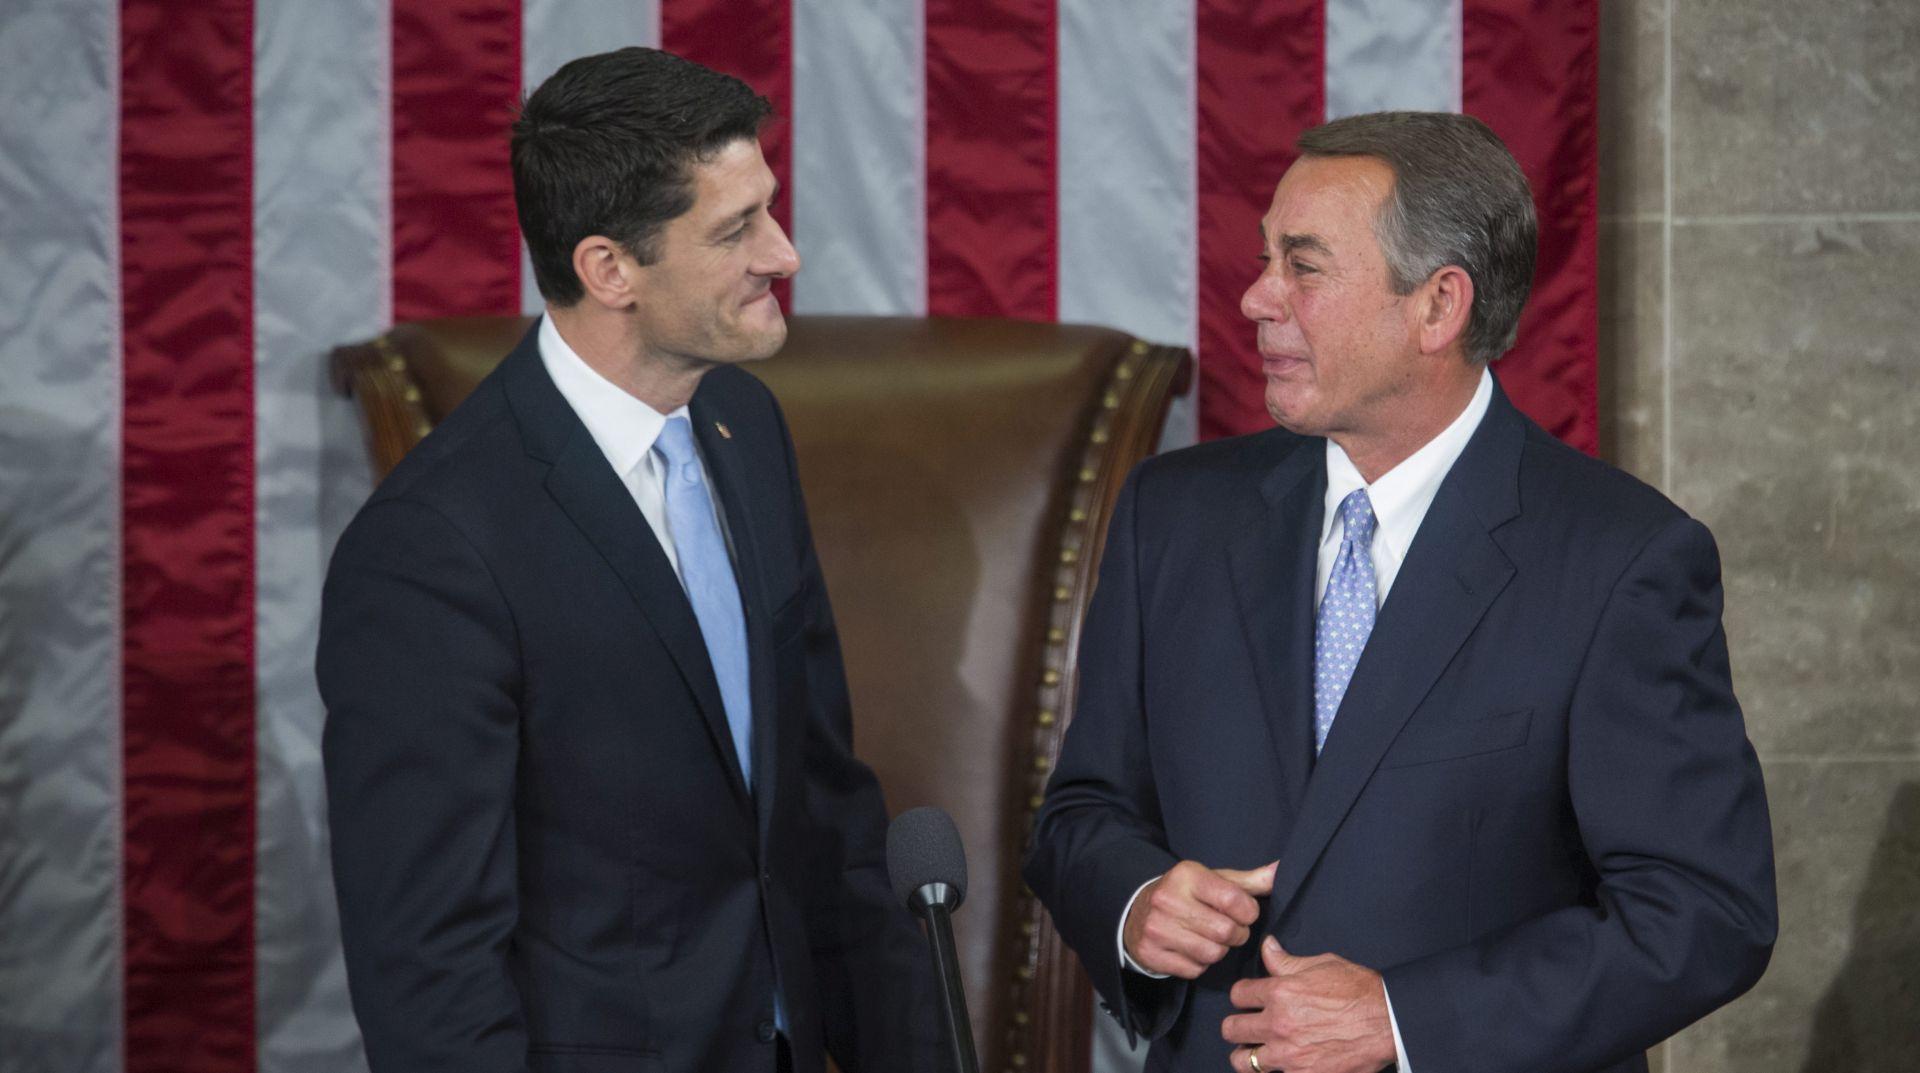 Paul Ryan novi predsjednik američkog Kongresa